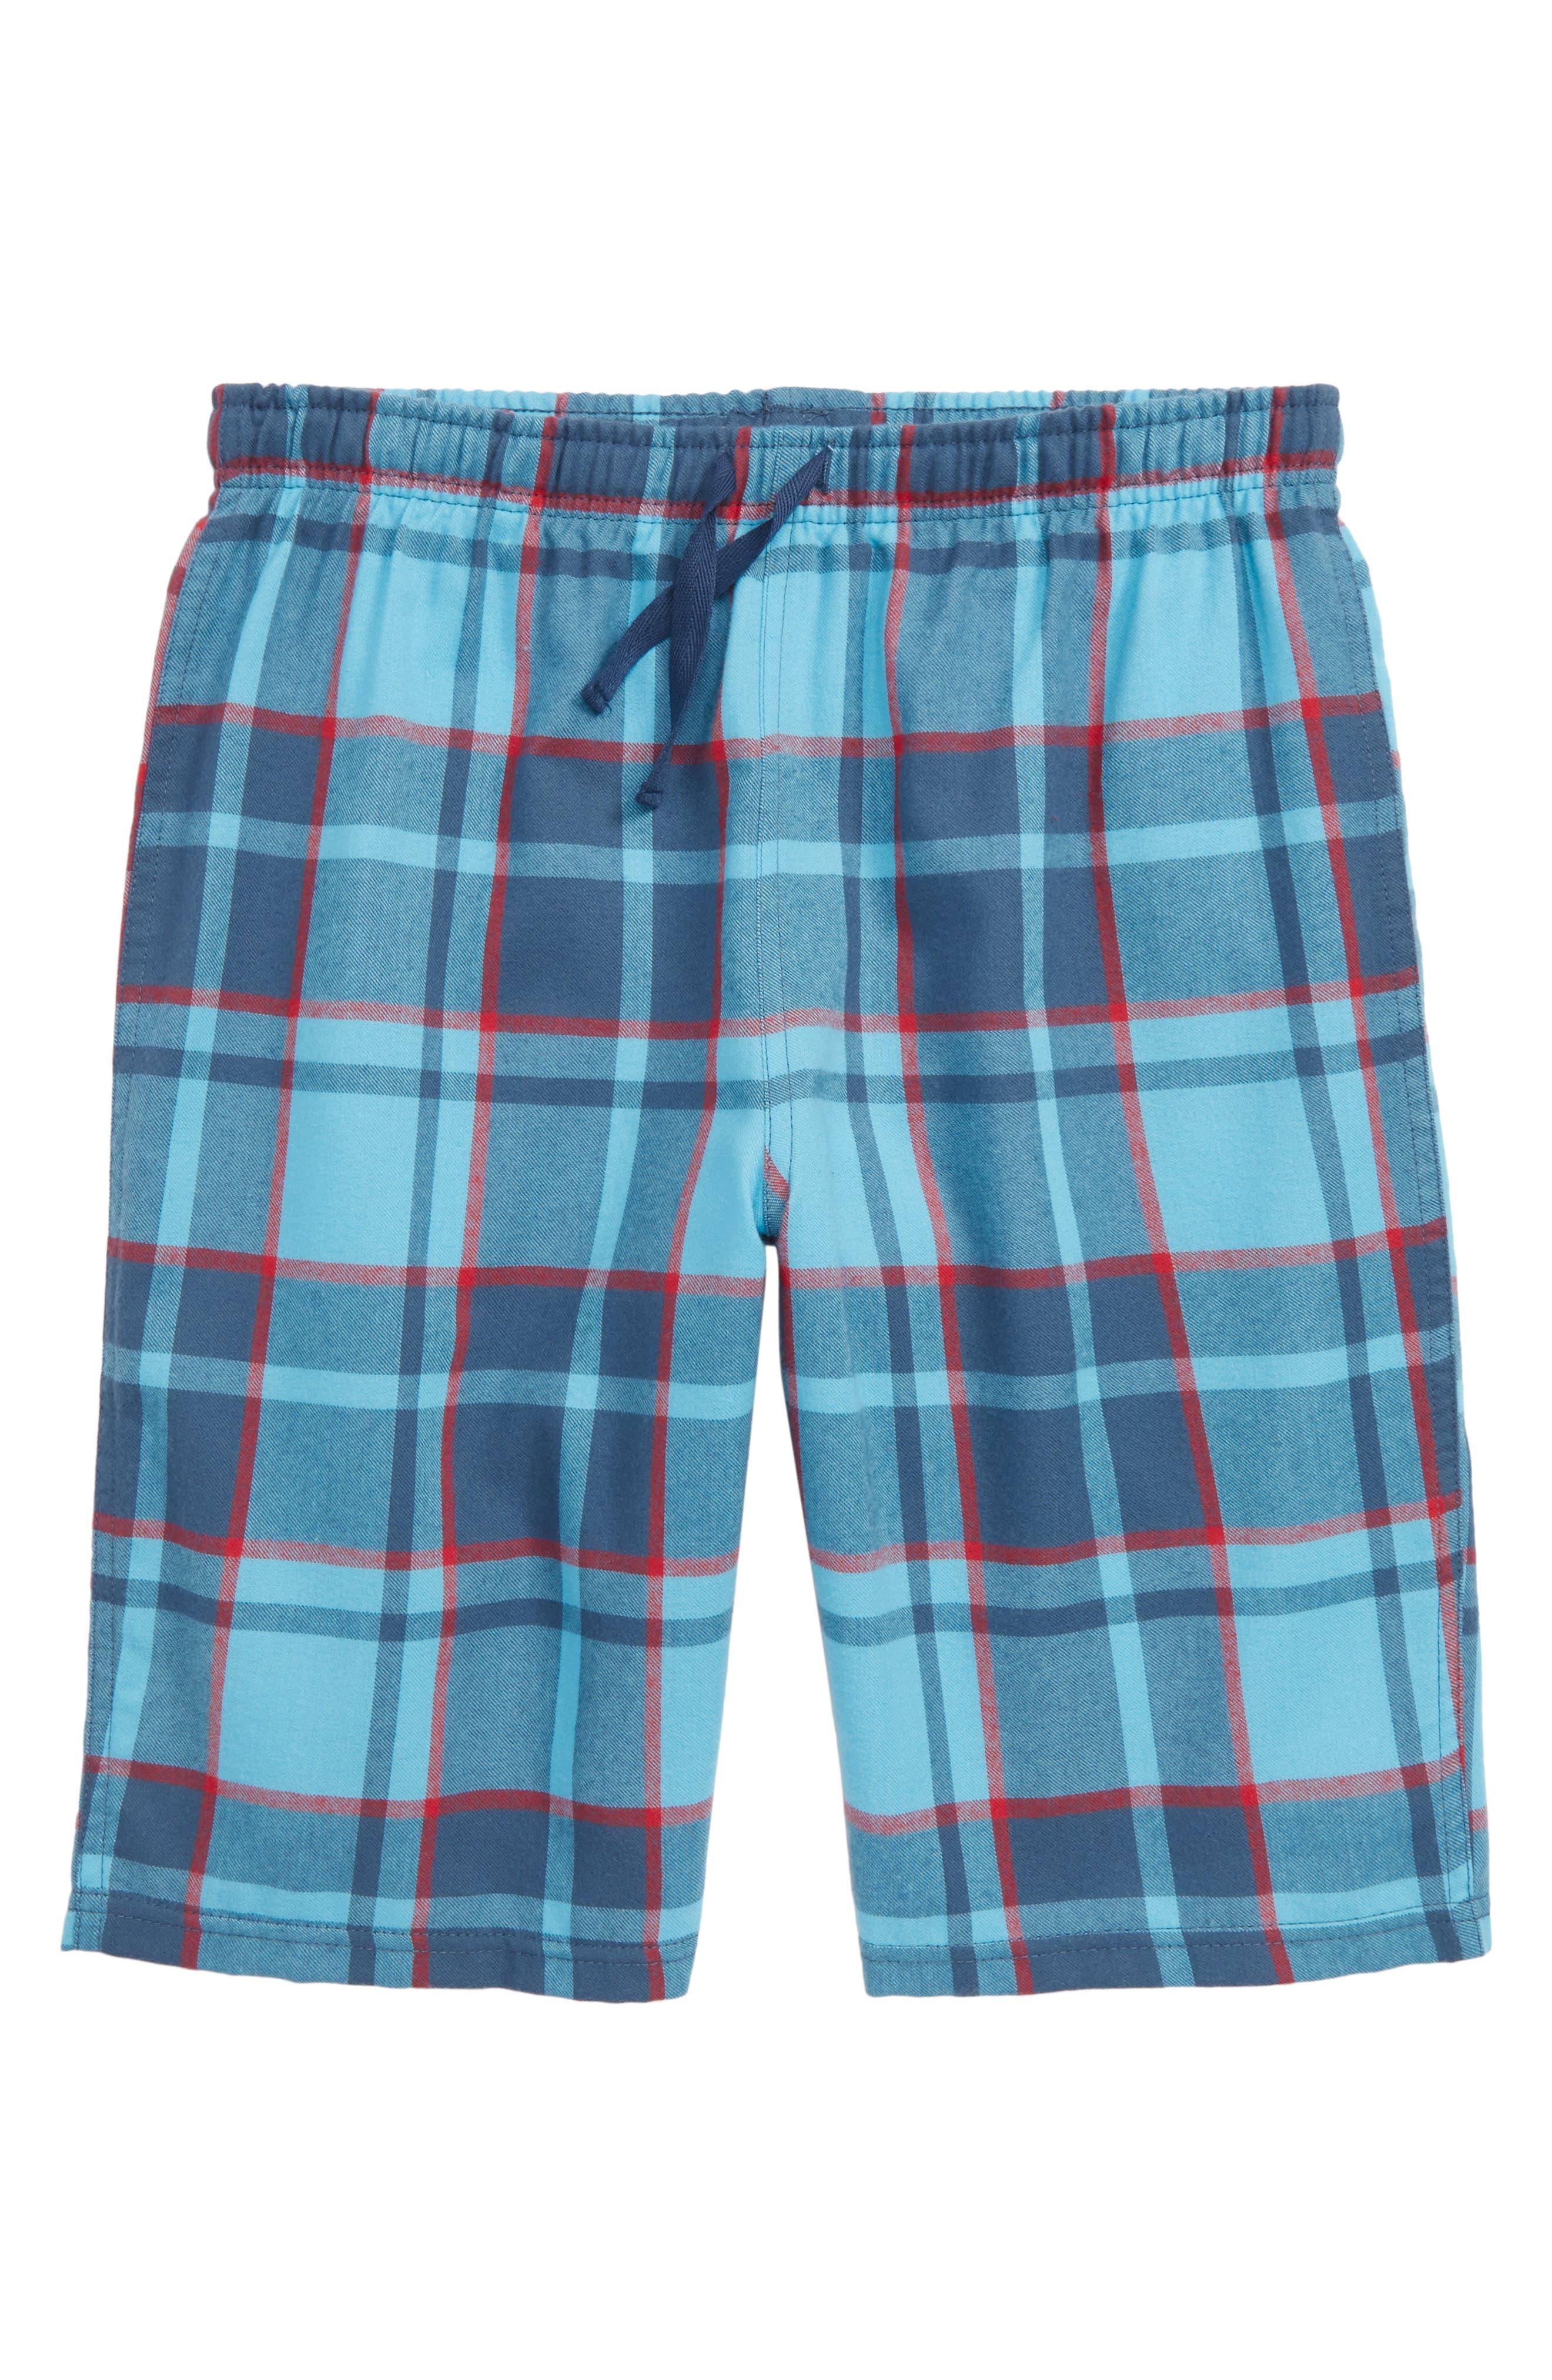 Flannel Shorts,                         Main,                         color, Blue River- Navy Plaid